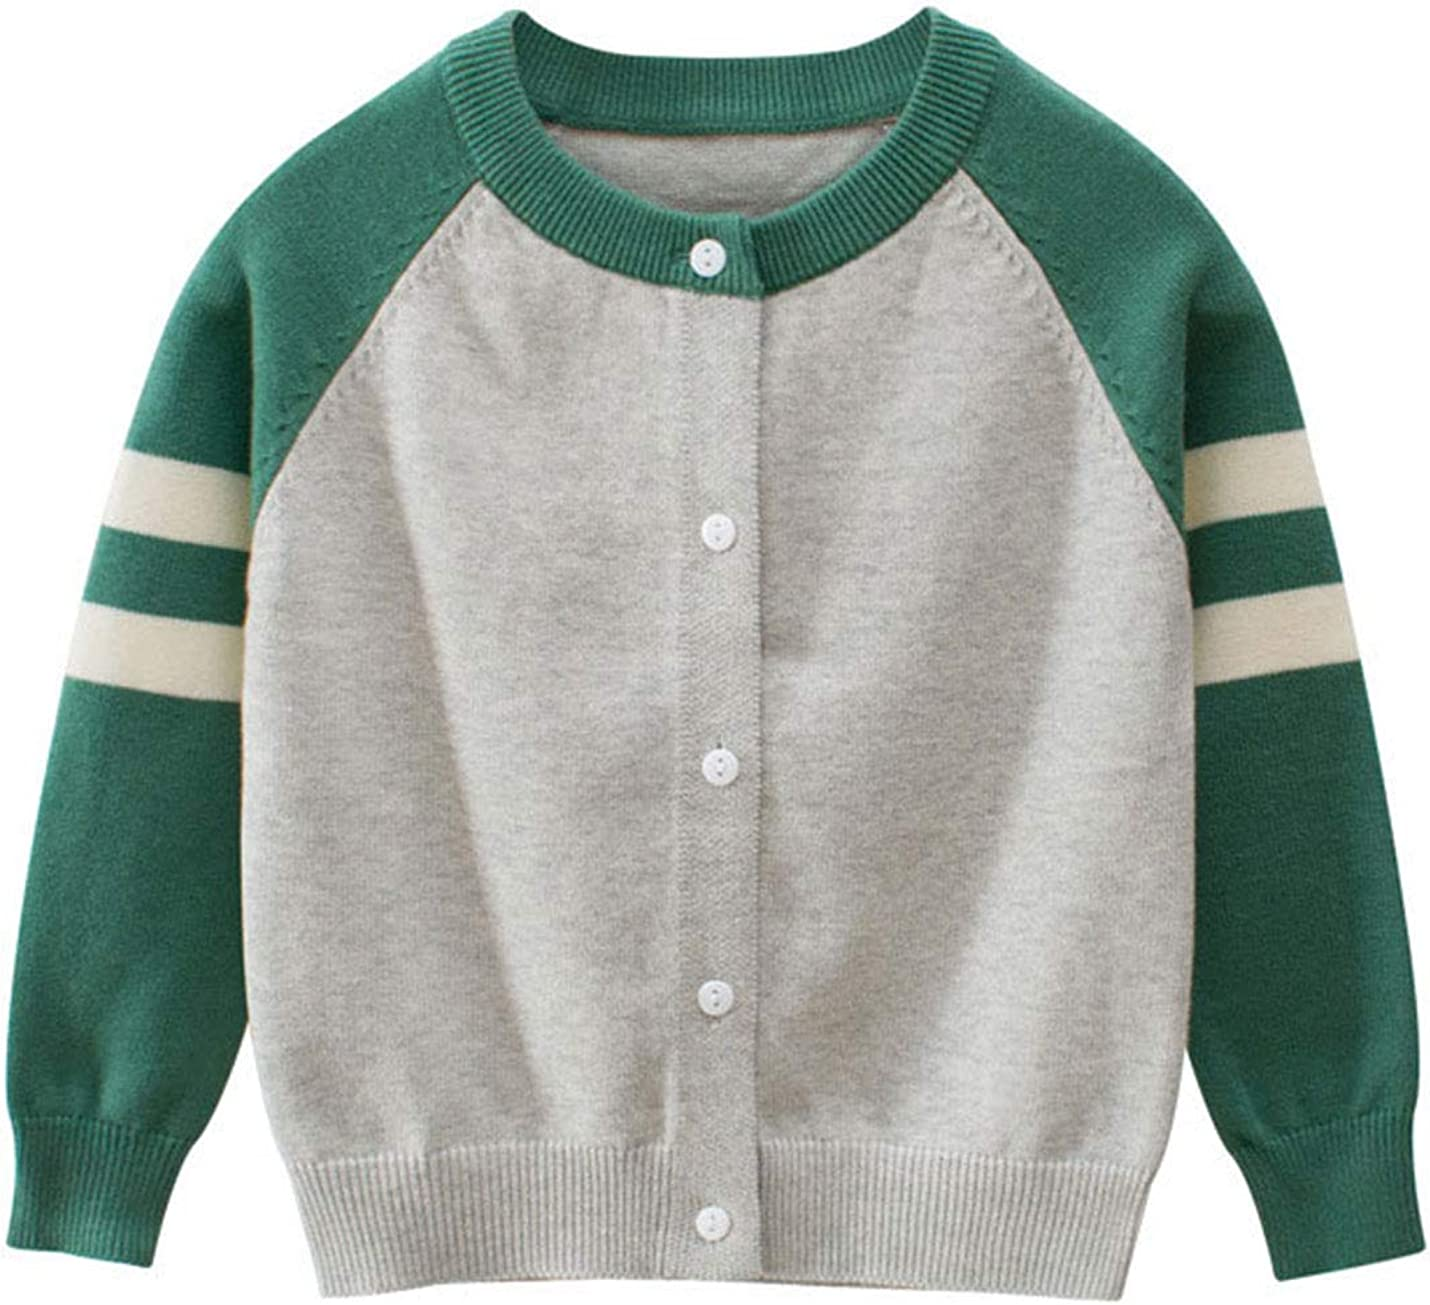 AMEBELLE Boys' Girls Unisex Kids Knit Cardigan Sweaters Baby Boys Girls Cotton Basic Sweater 2-8T